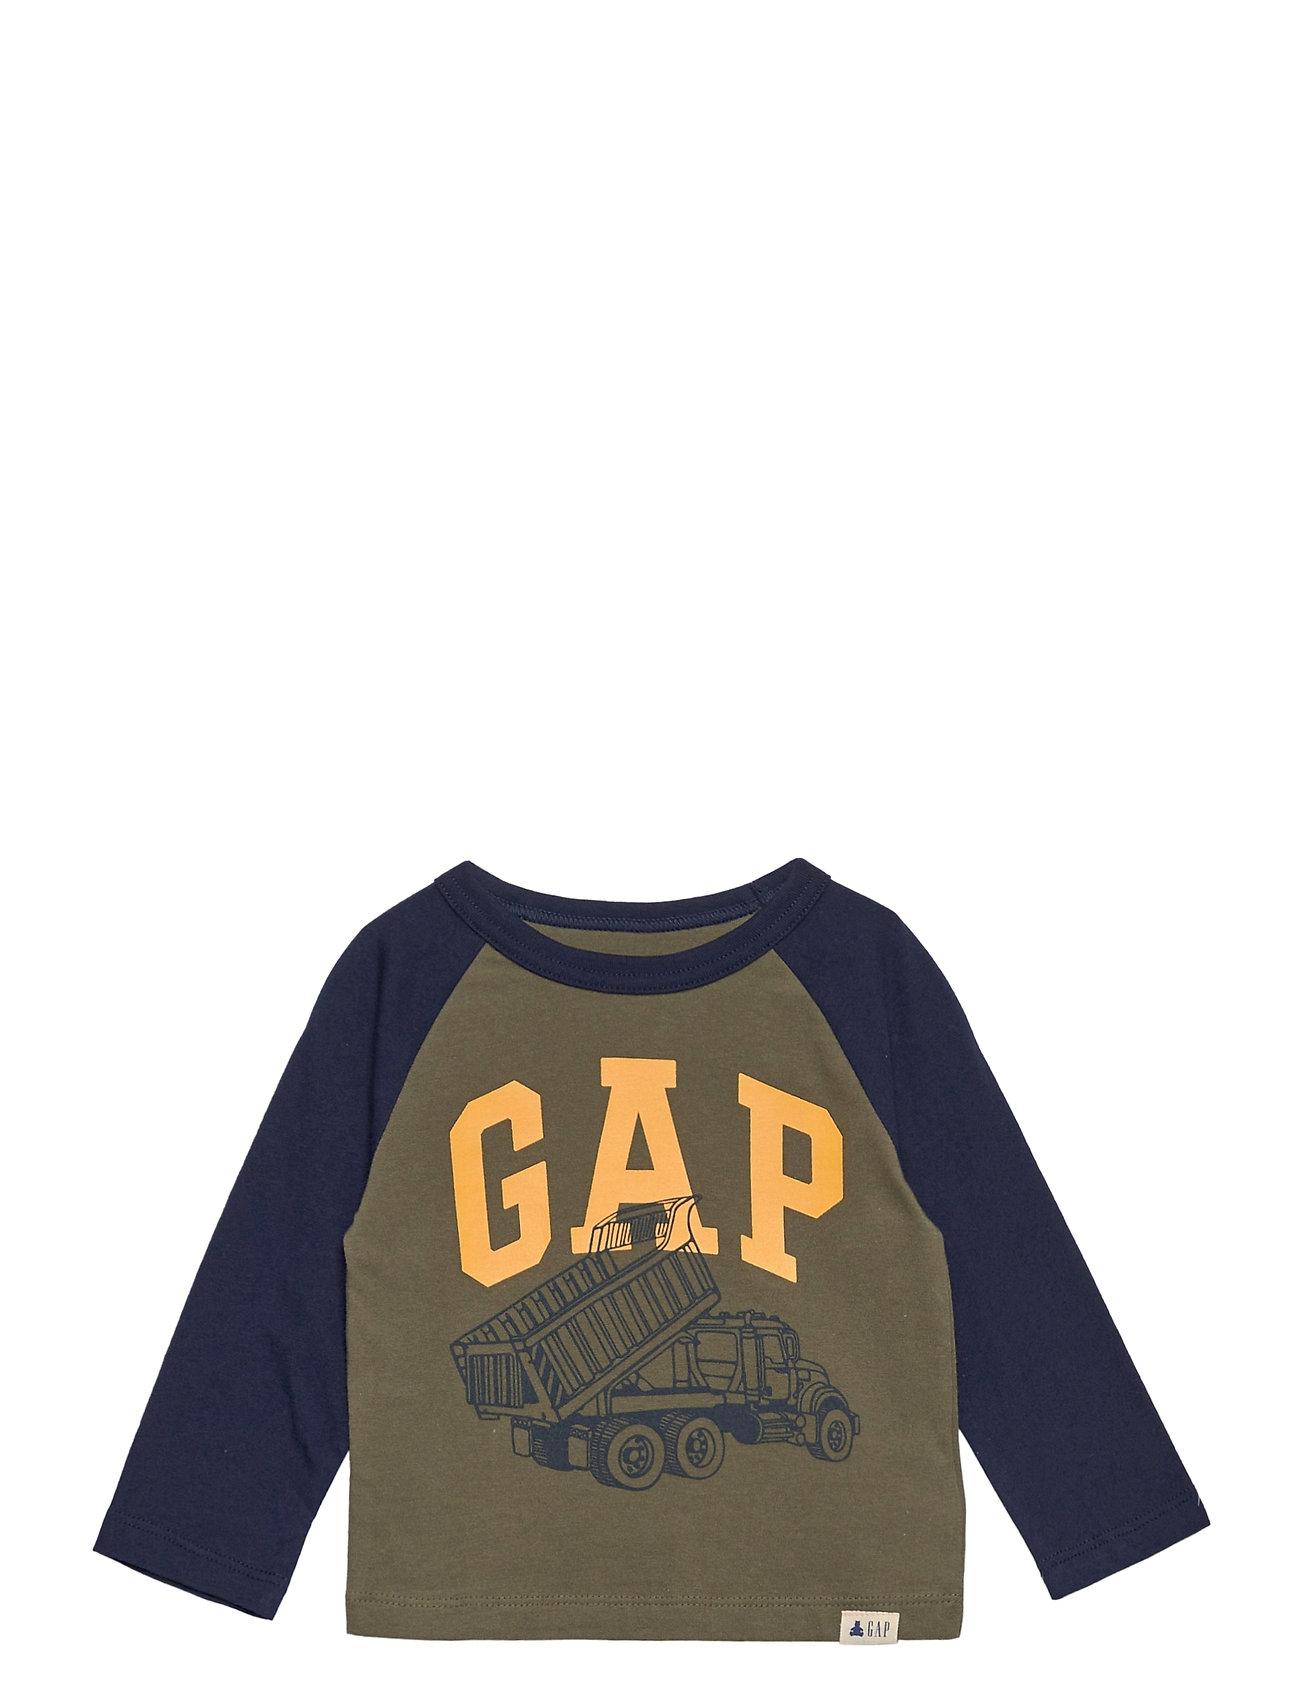 Image of Toddler Mix And Match Gap Logo Graphic Shirt Langærmet T-shirt Grøn GAP (3456630529)